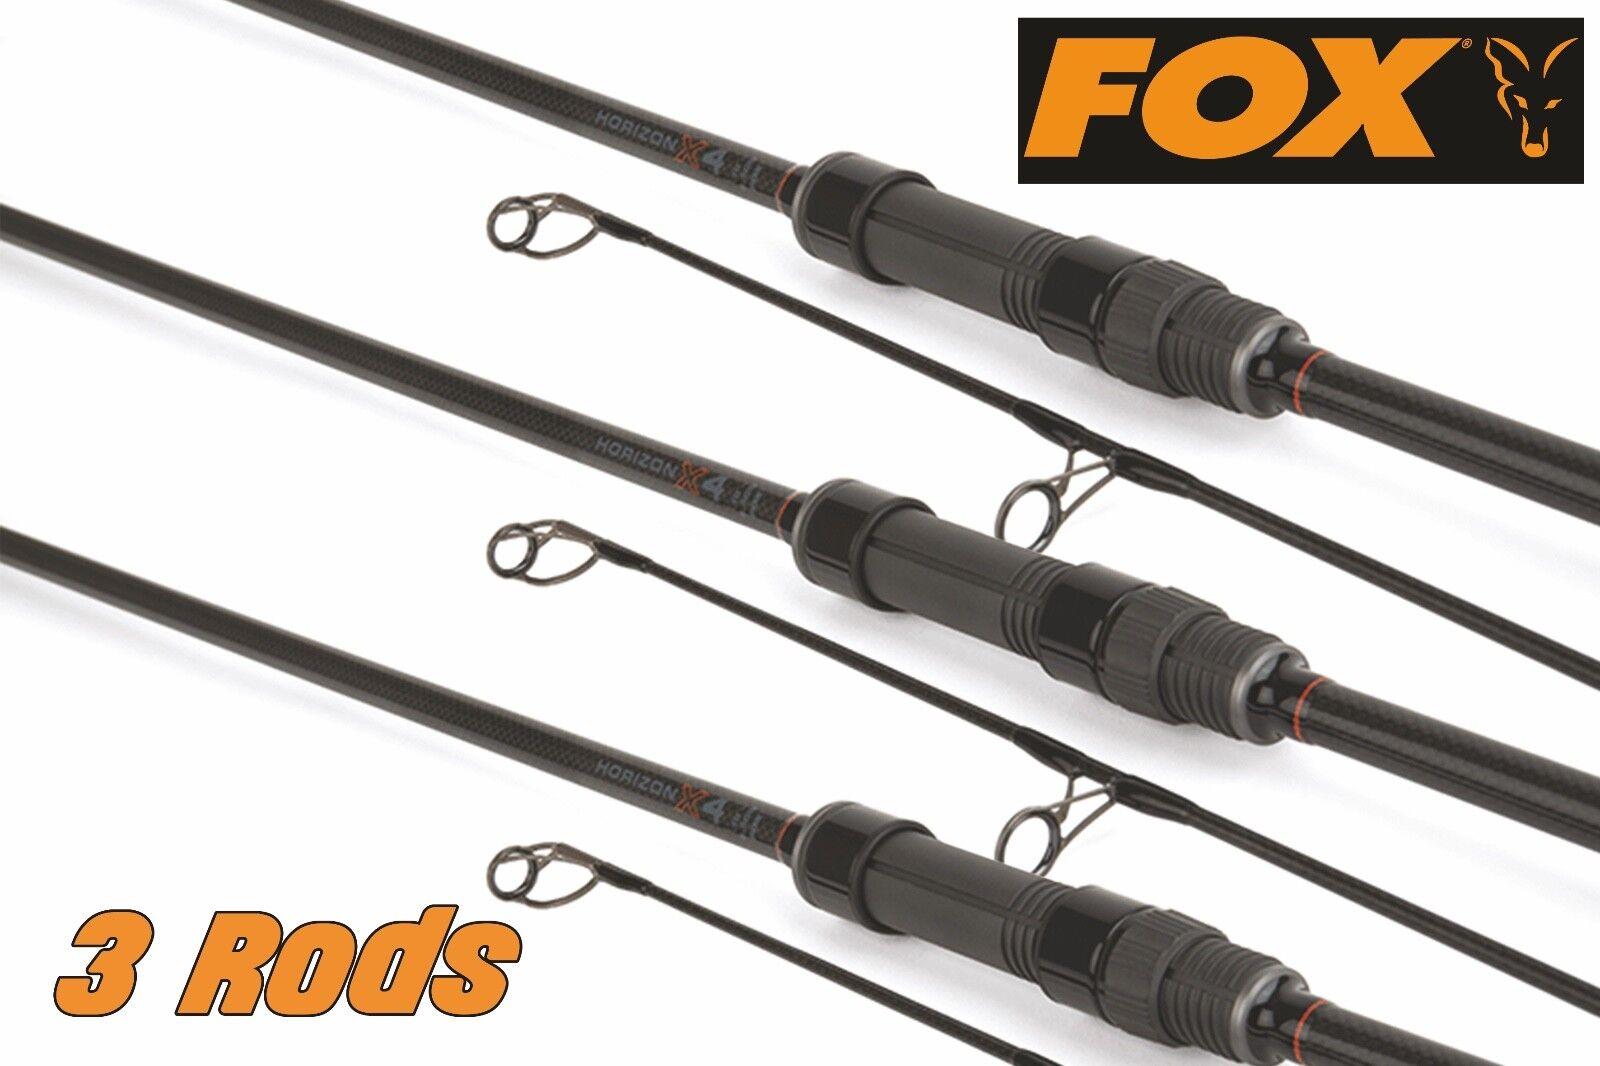 FOX Horizon X4 Abbreviated Handle 10ft 3.00lb CRD281 x 3 + FREE P&P